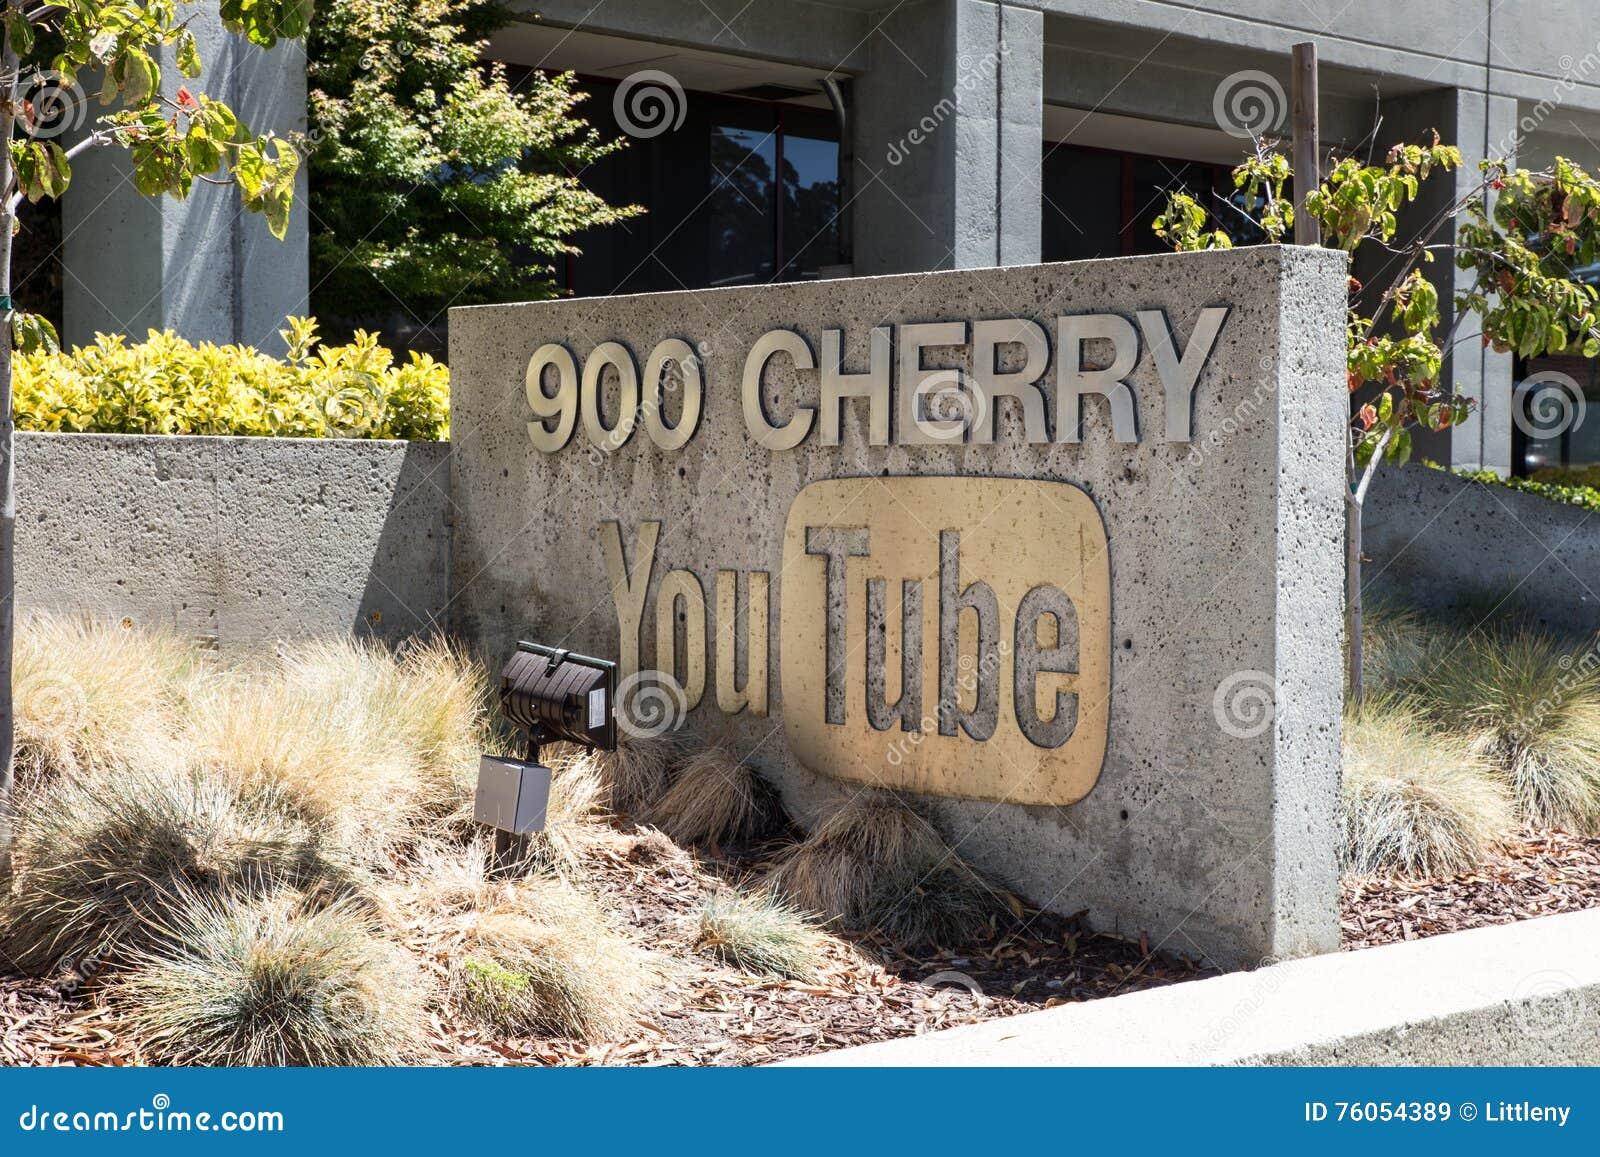 Youtube-Hauptsitze